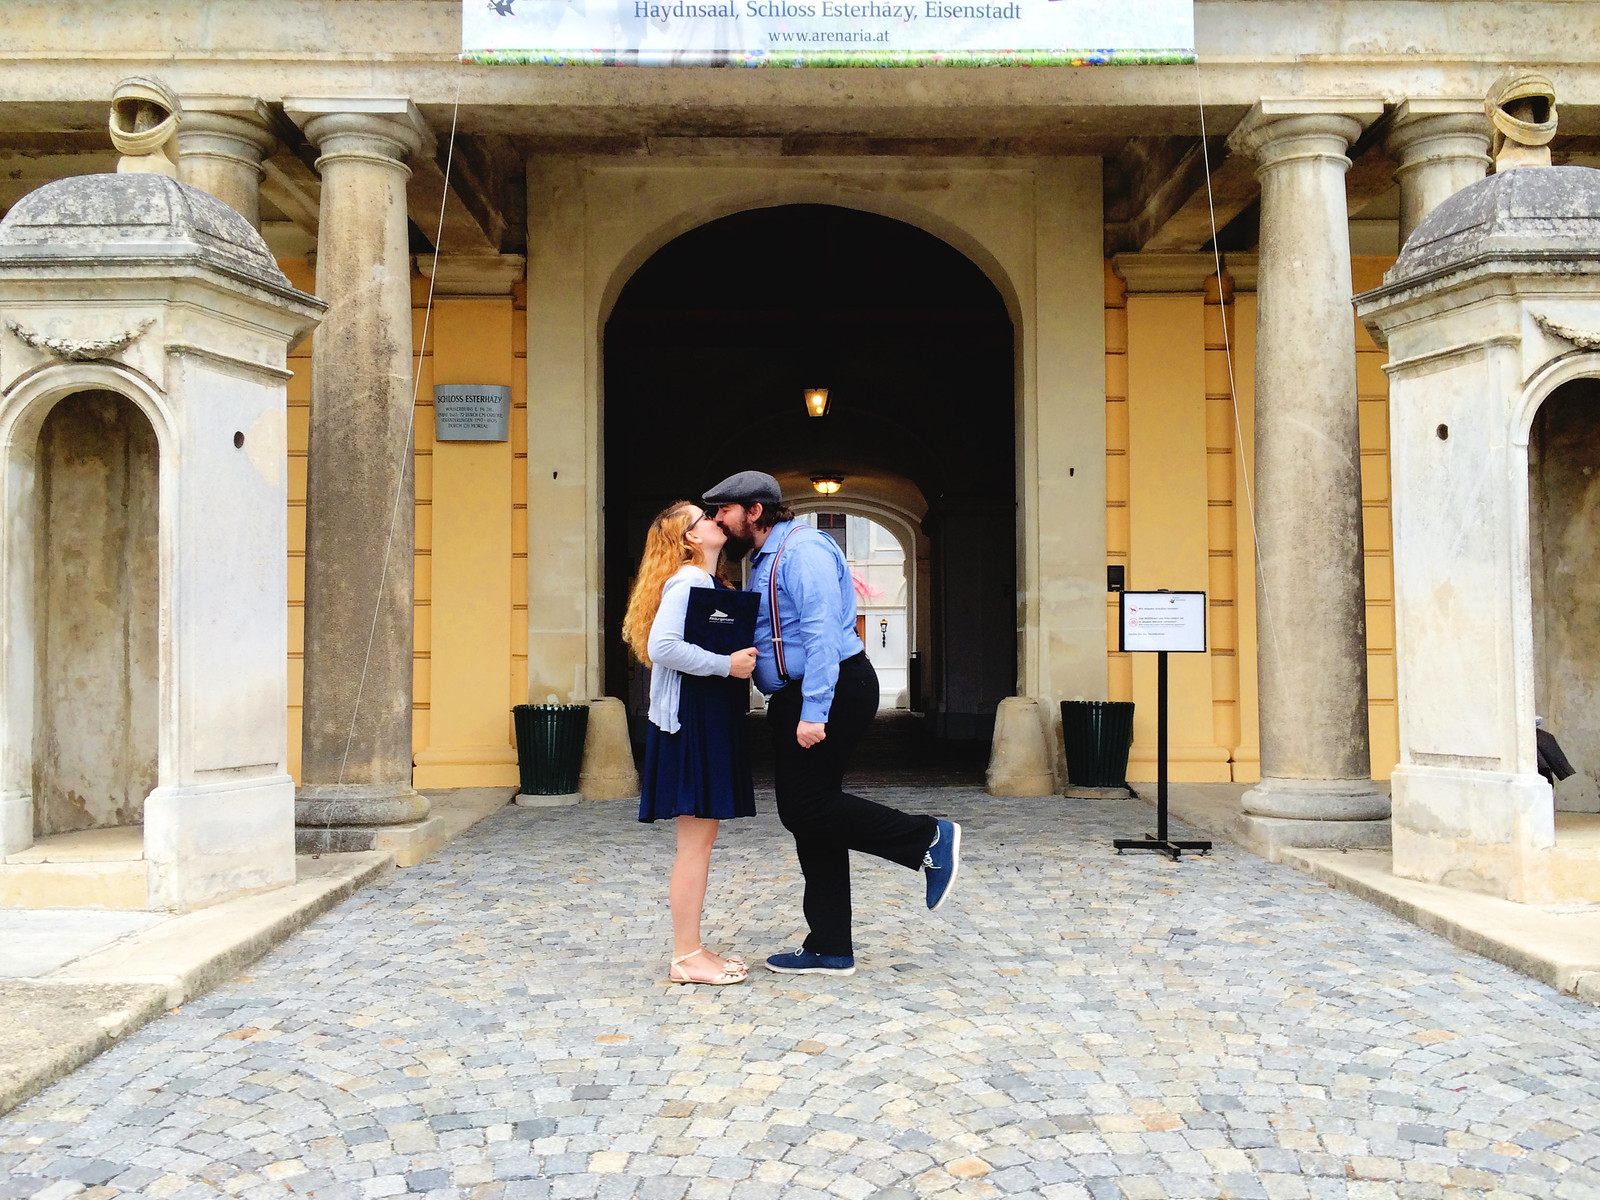 ich habe den pannonian research award 2014 gewonnen. ___ #VSCOcam #DundSamschmusen #FH #FHburgenland #research #igersburgenland #study #esterhazy